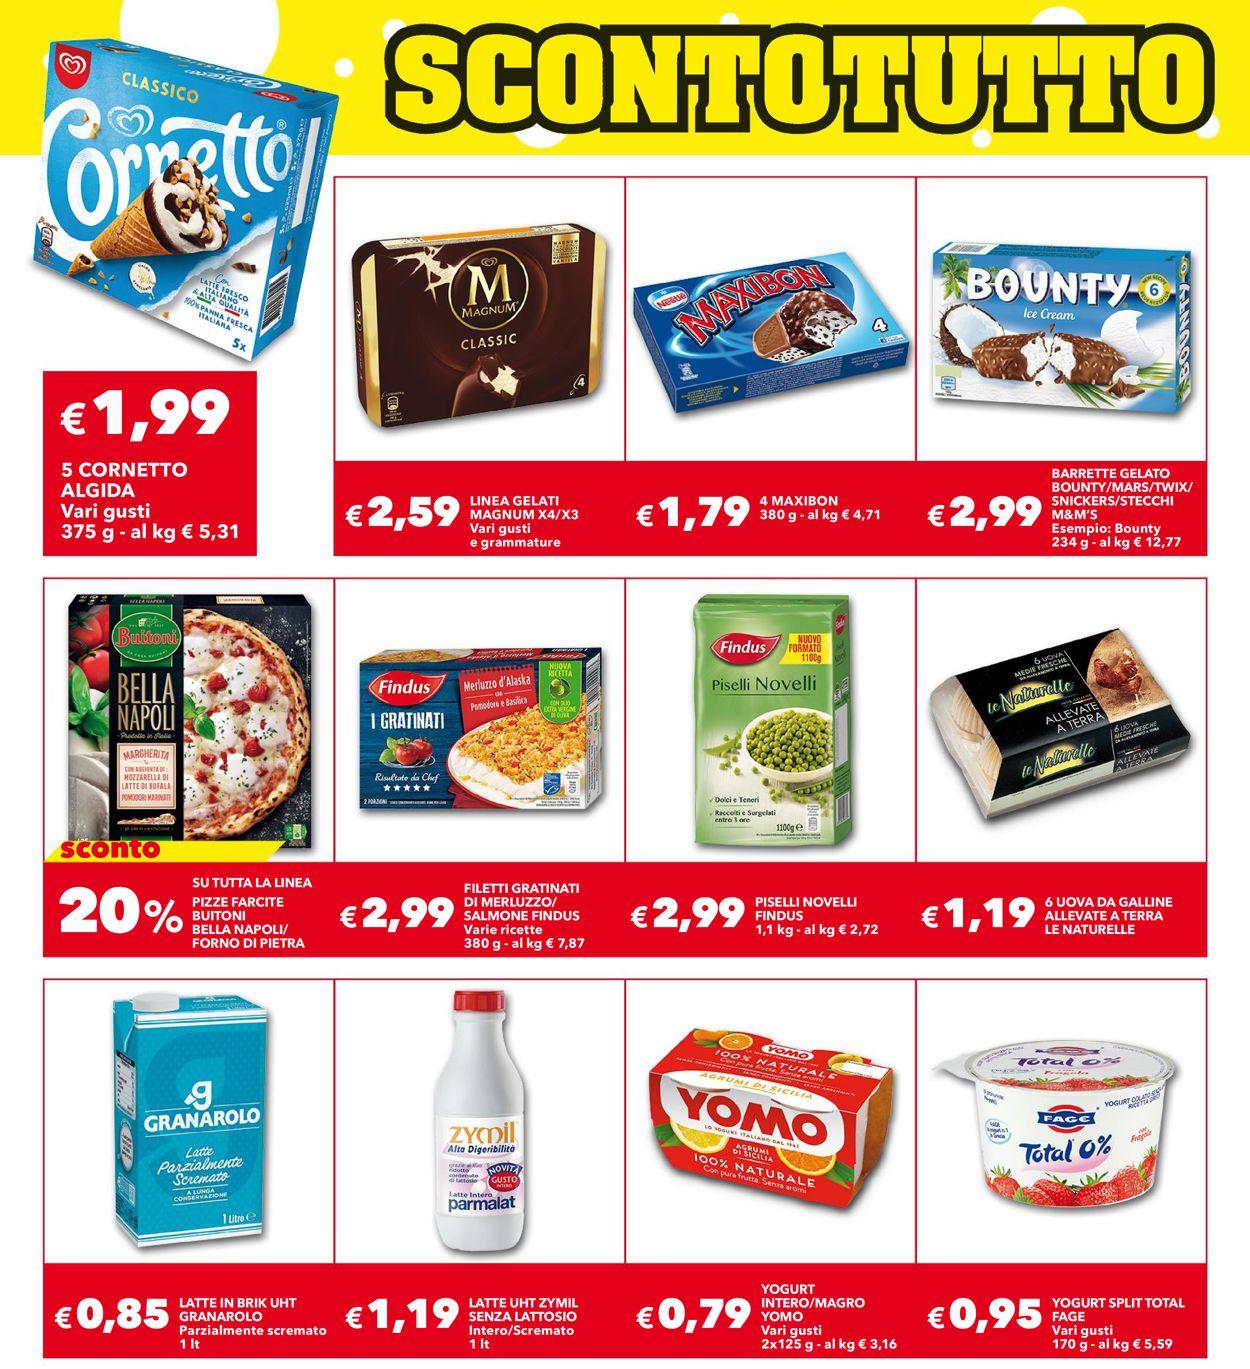 Volantino Auchan - Offerte 30/07-12/08/2020 (Pagina 6)